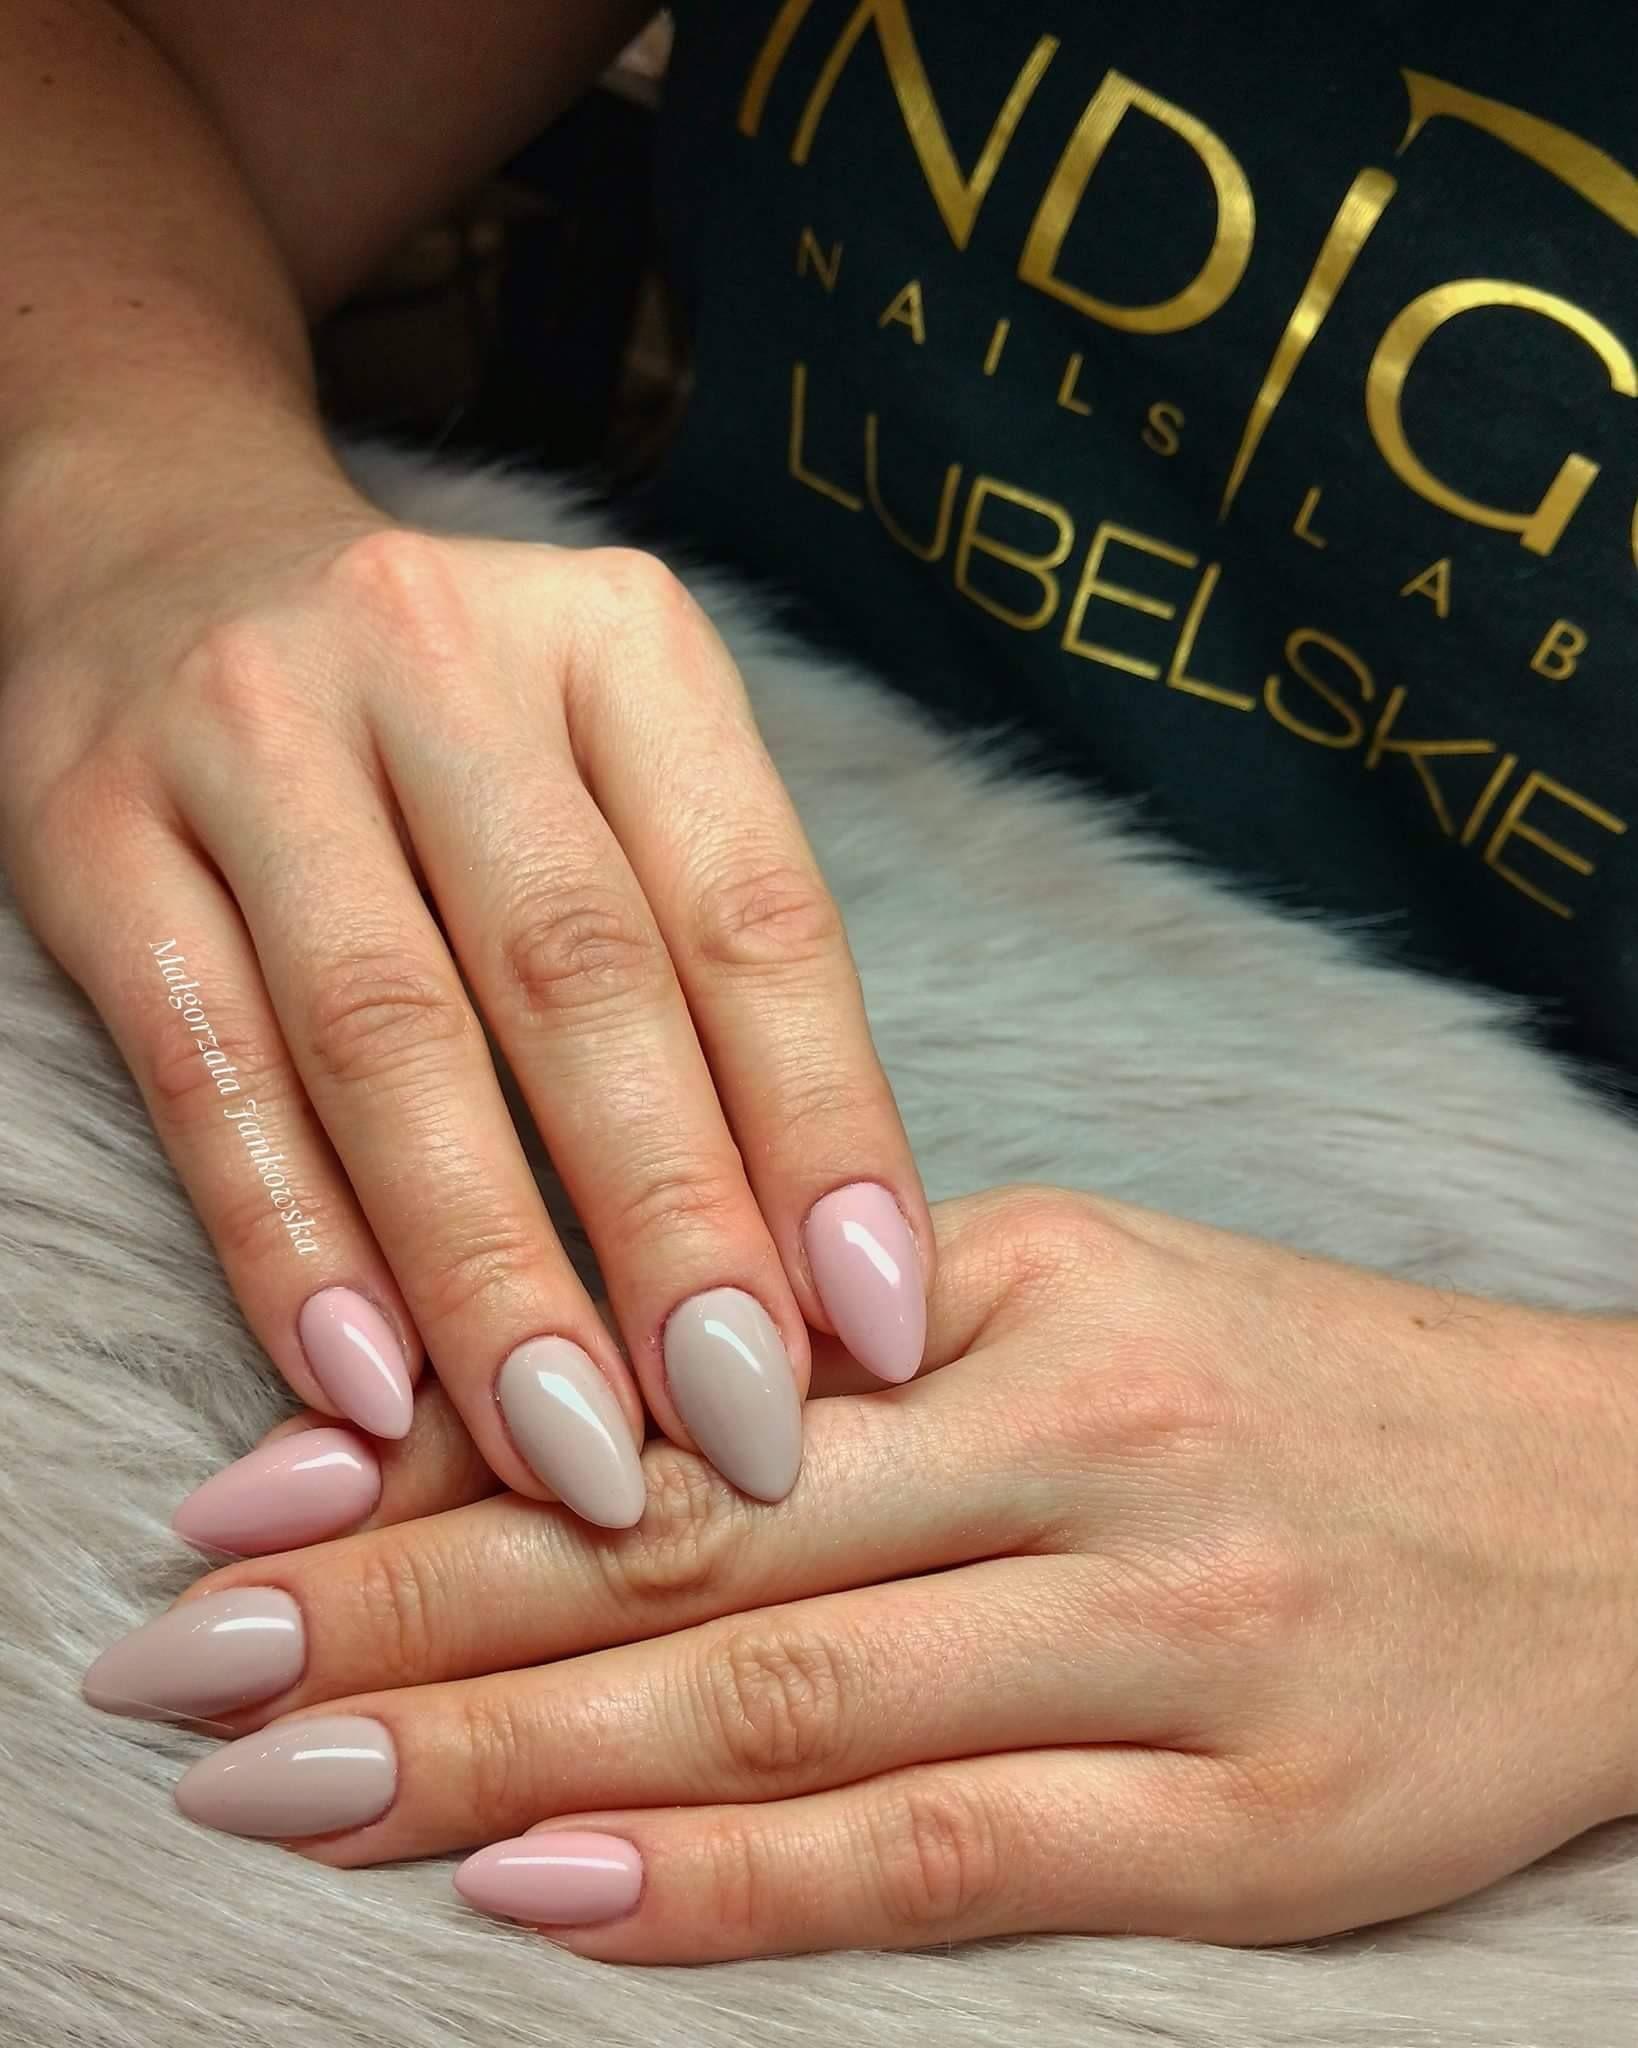 Pin de Iva Morán en Perfect and easier nails | Pinterest | Cabello y ...